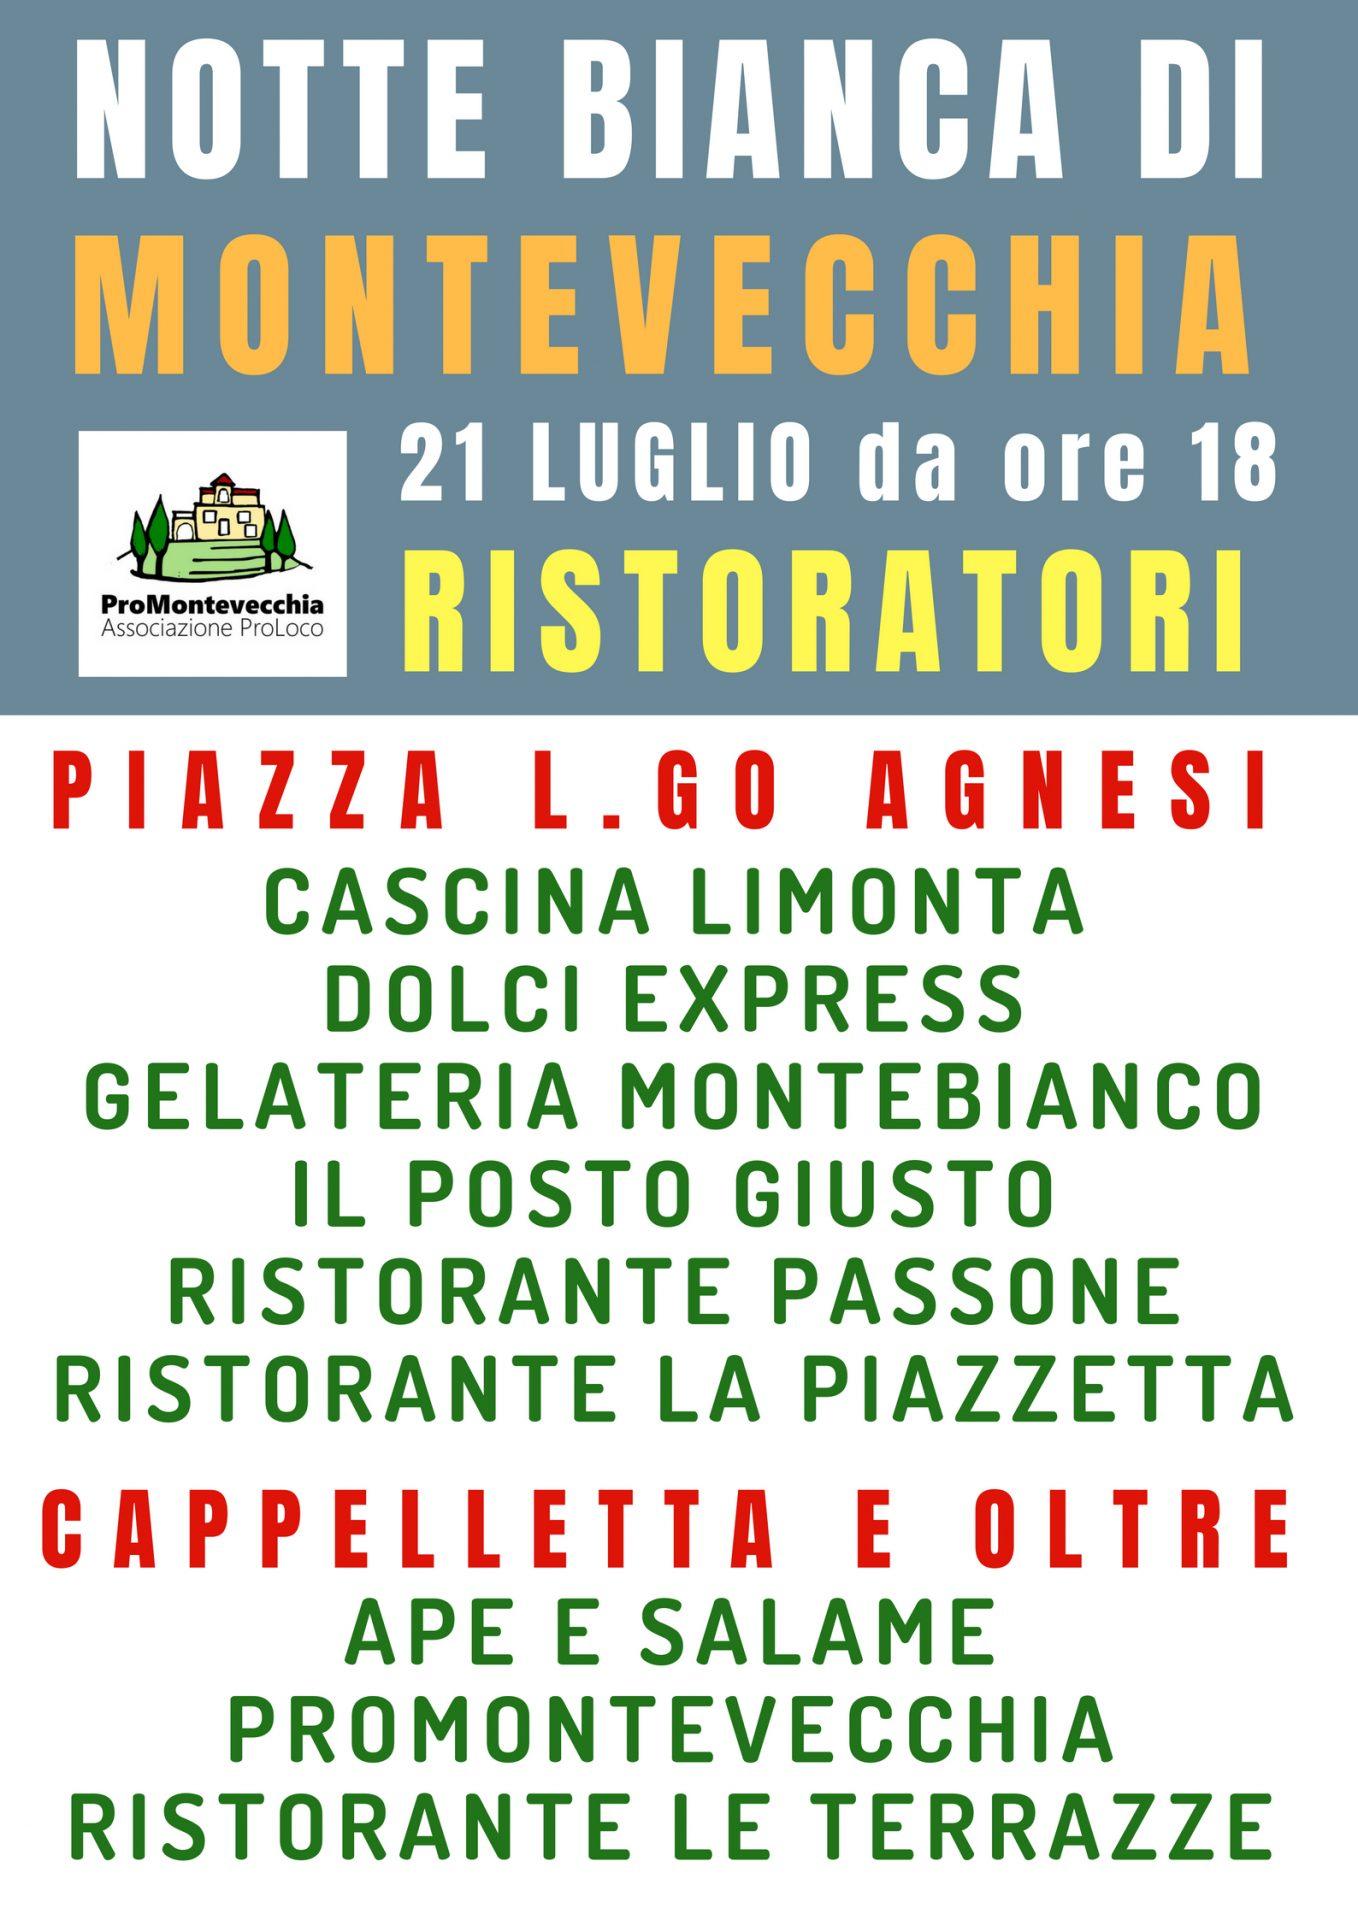 Ristorati Notte Bianca Montevecchia 2018 | ProMontevecchia